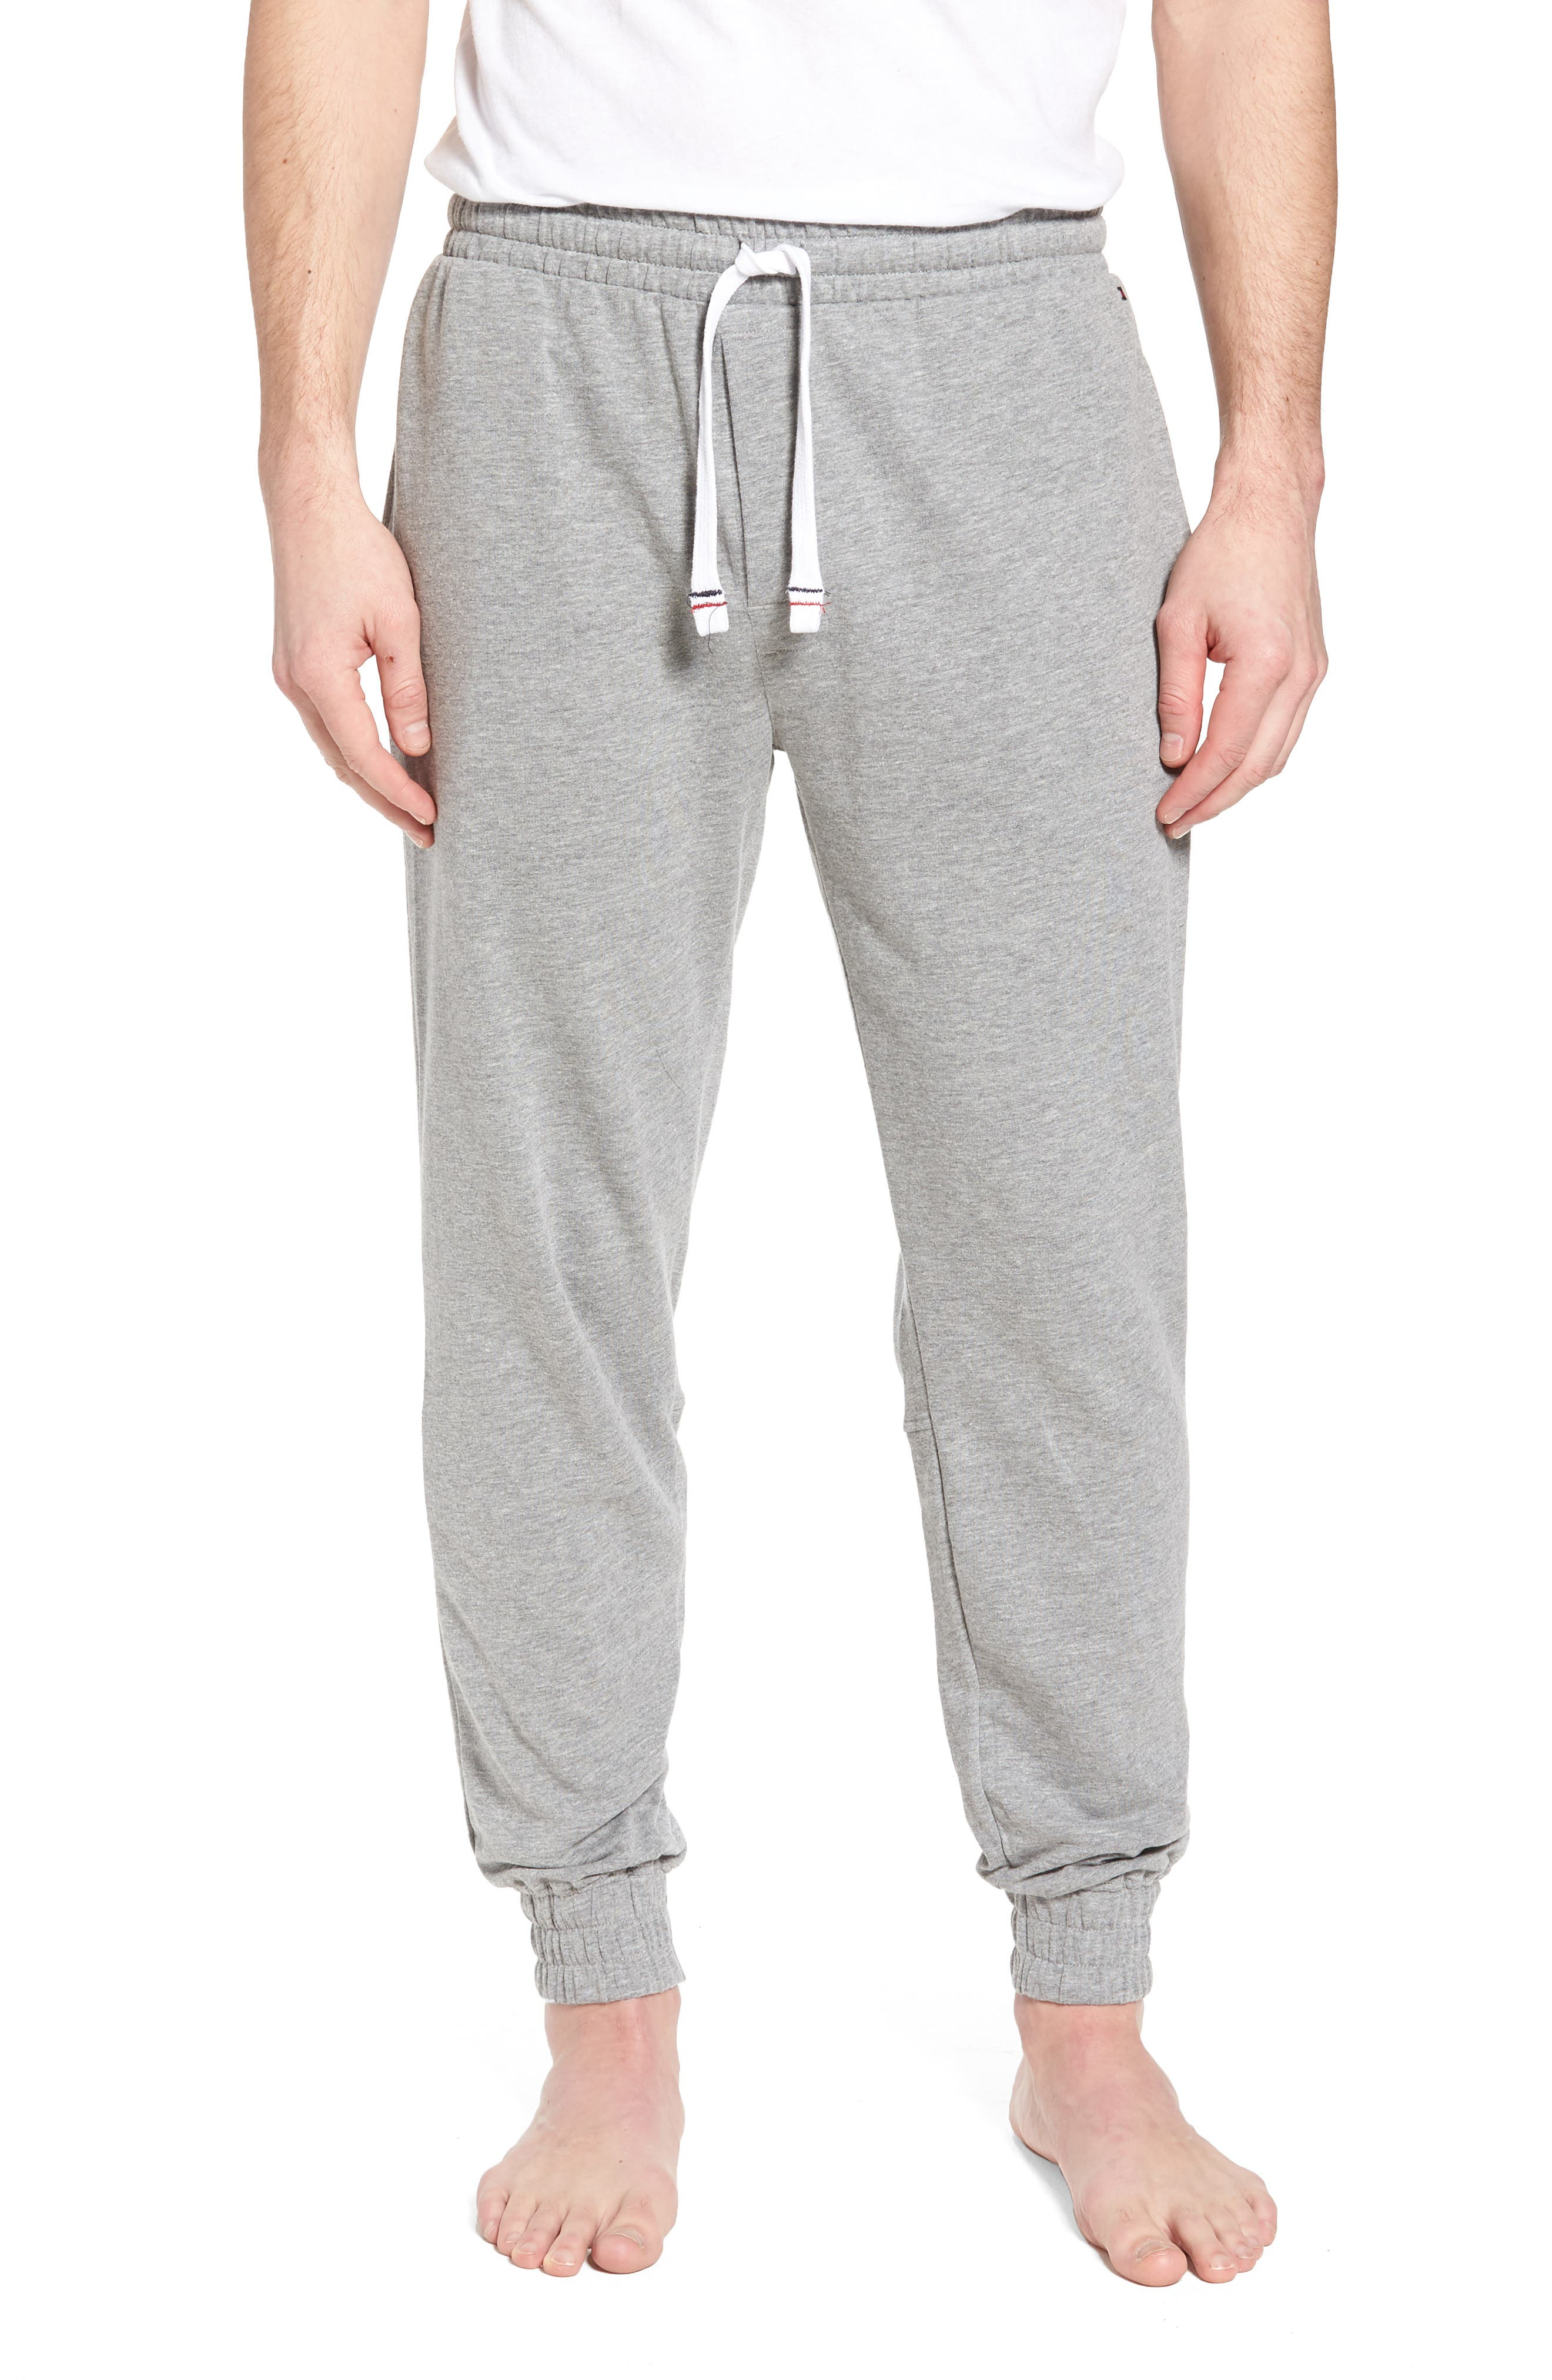 Jogger Lounge Pants,                         Main,                         color, GREY HEATHER